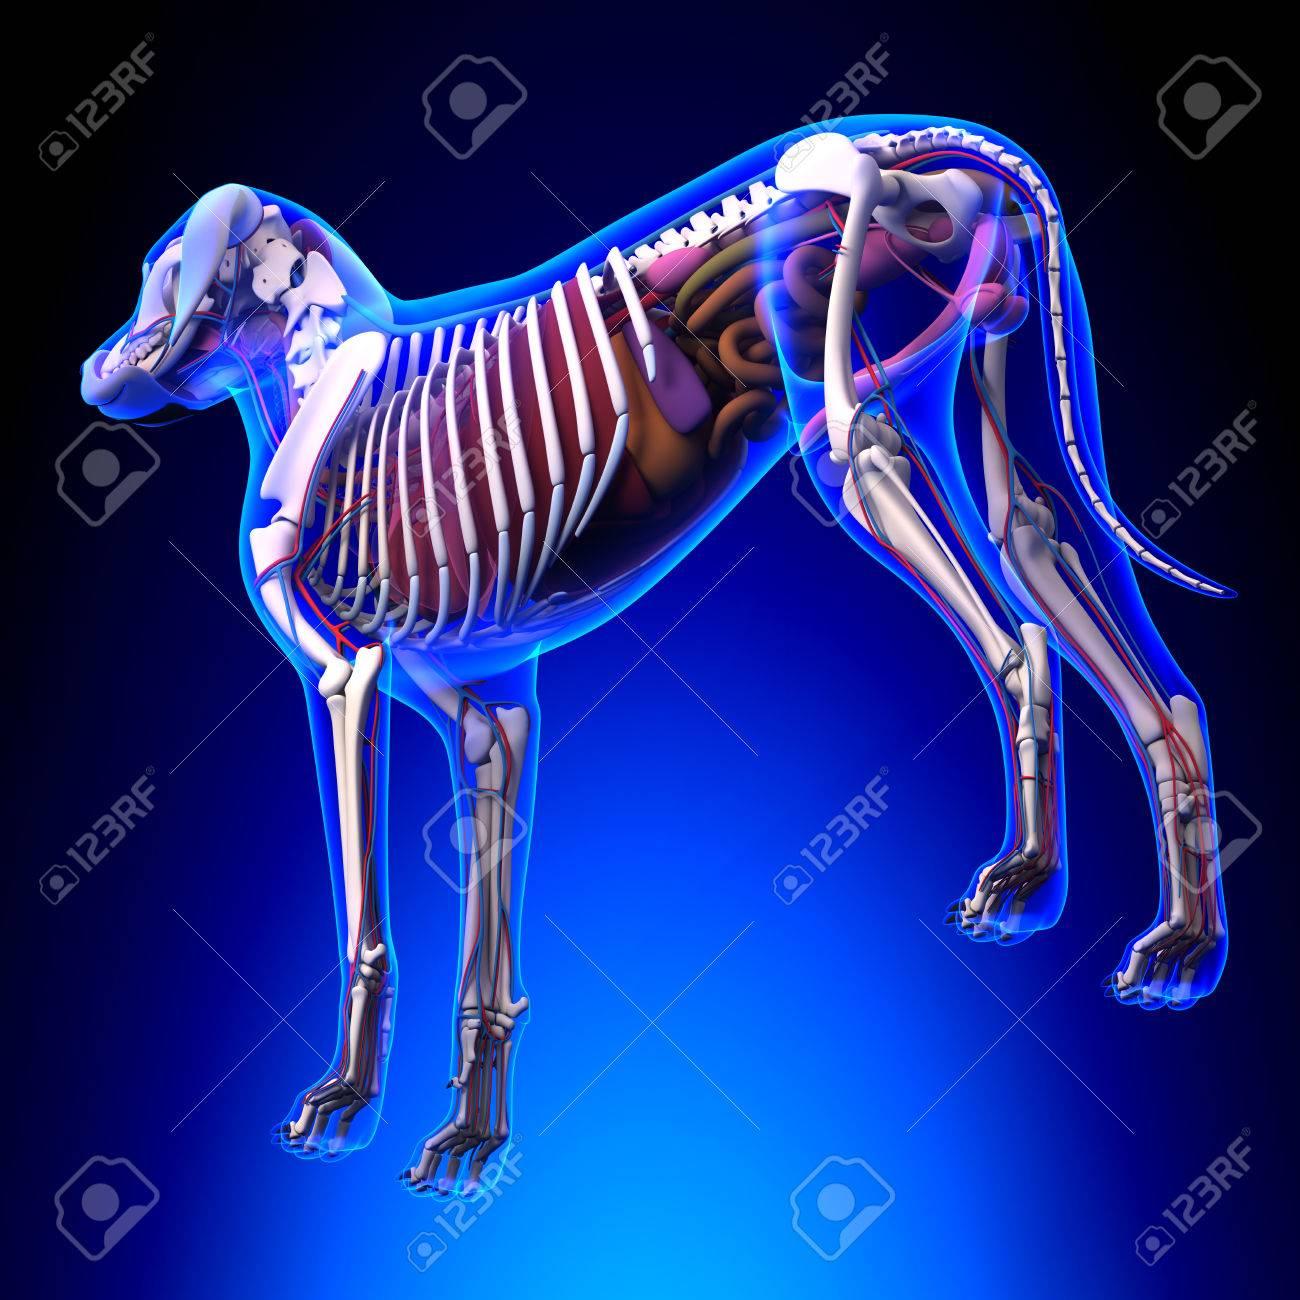 Dog Internal Organs Anatomy Anatomy Of A Male Dog Internal Stock